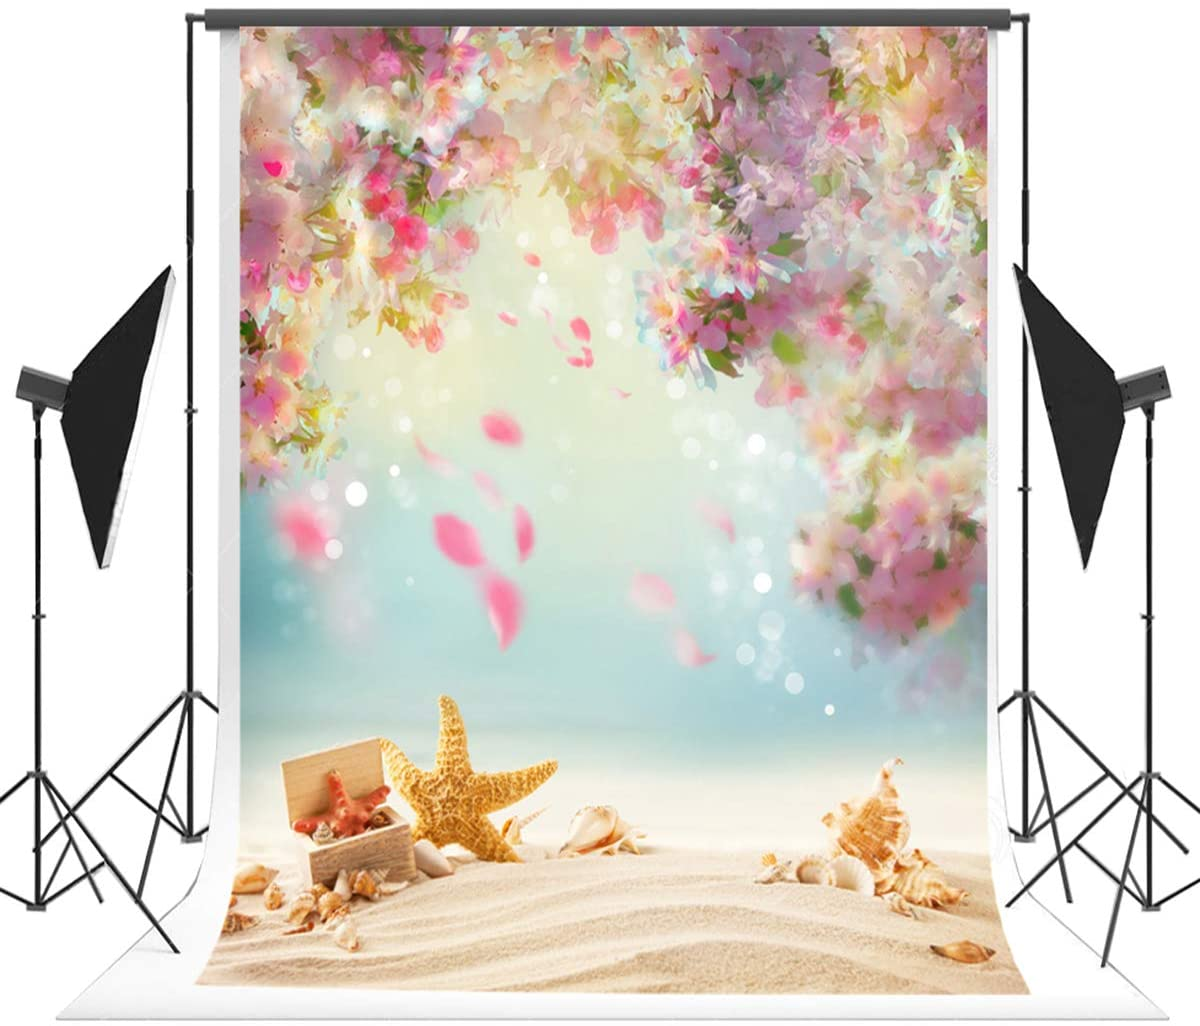 Amazoncom 5x7ft150x220cm Summer Photography Background Beach 1200x1026